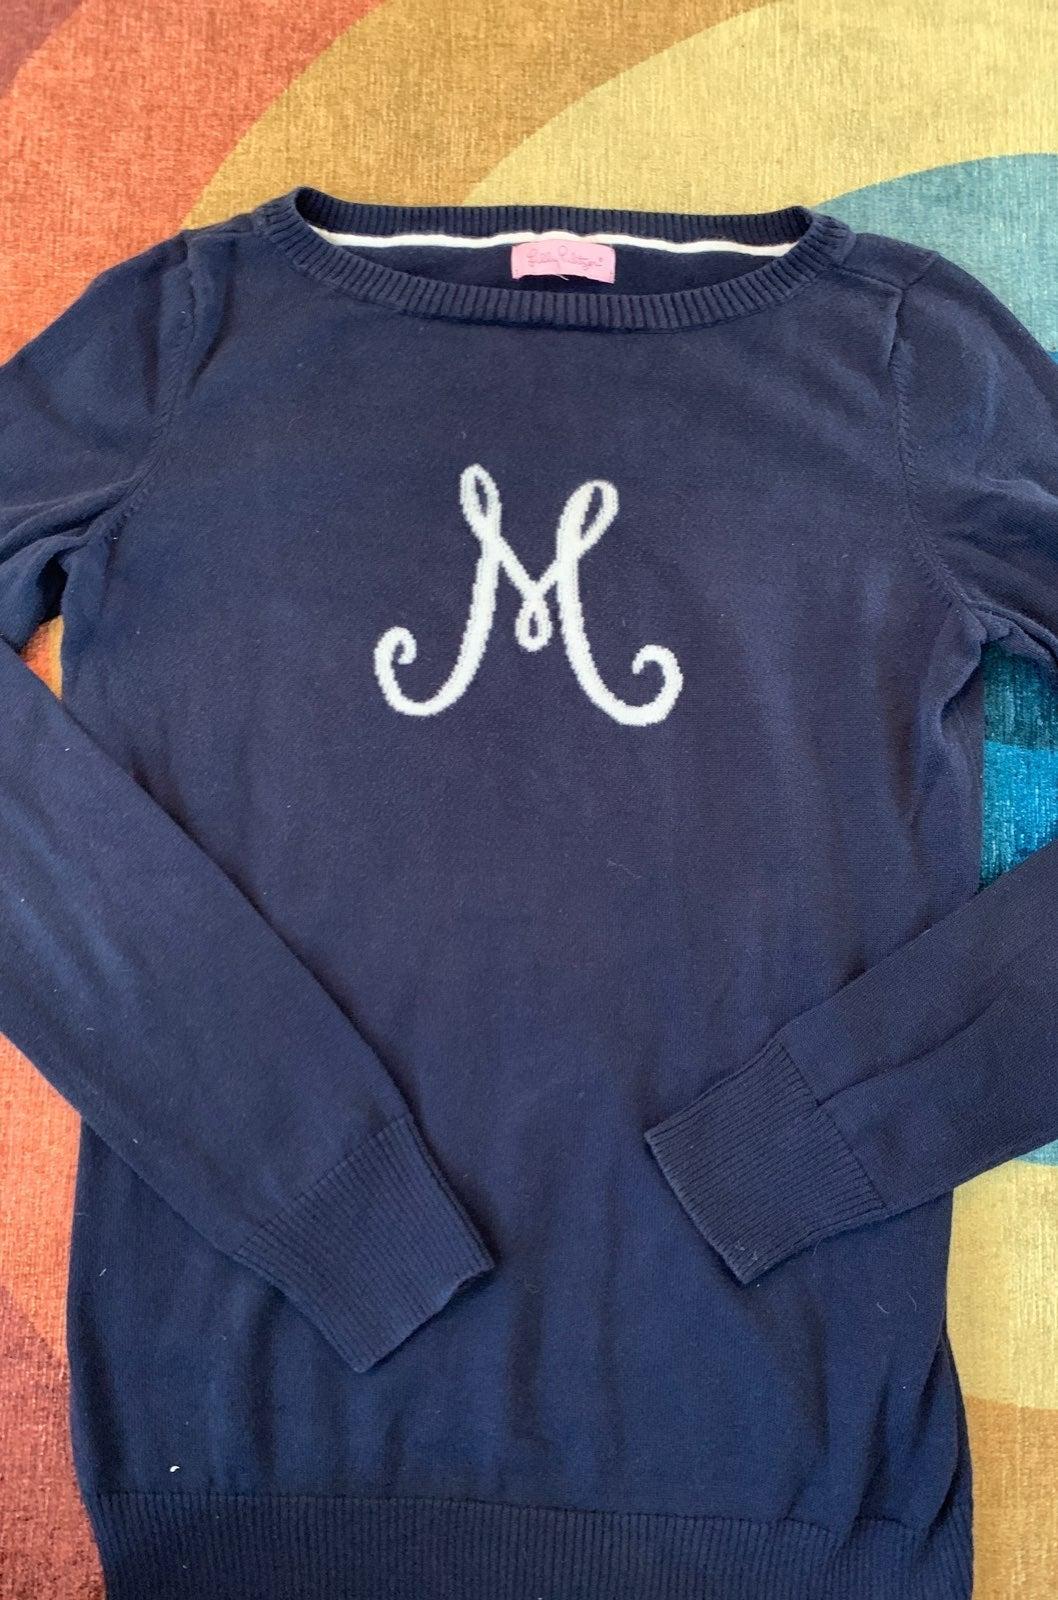 Lilly pulitzer navy M monogram sweater